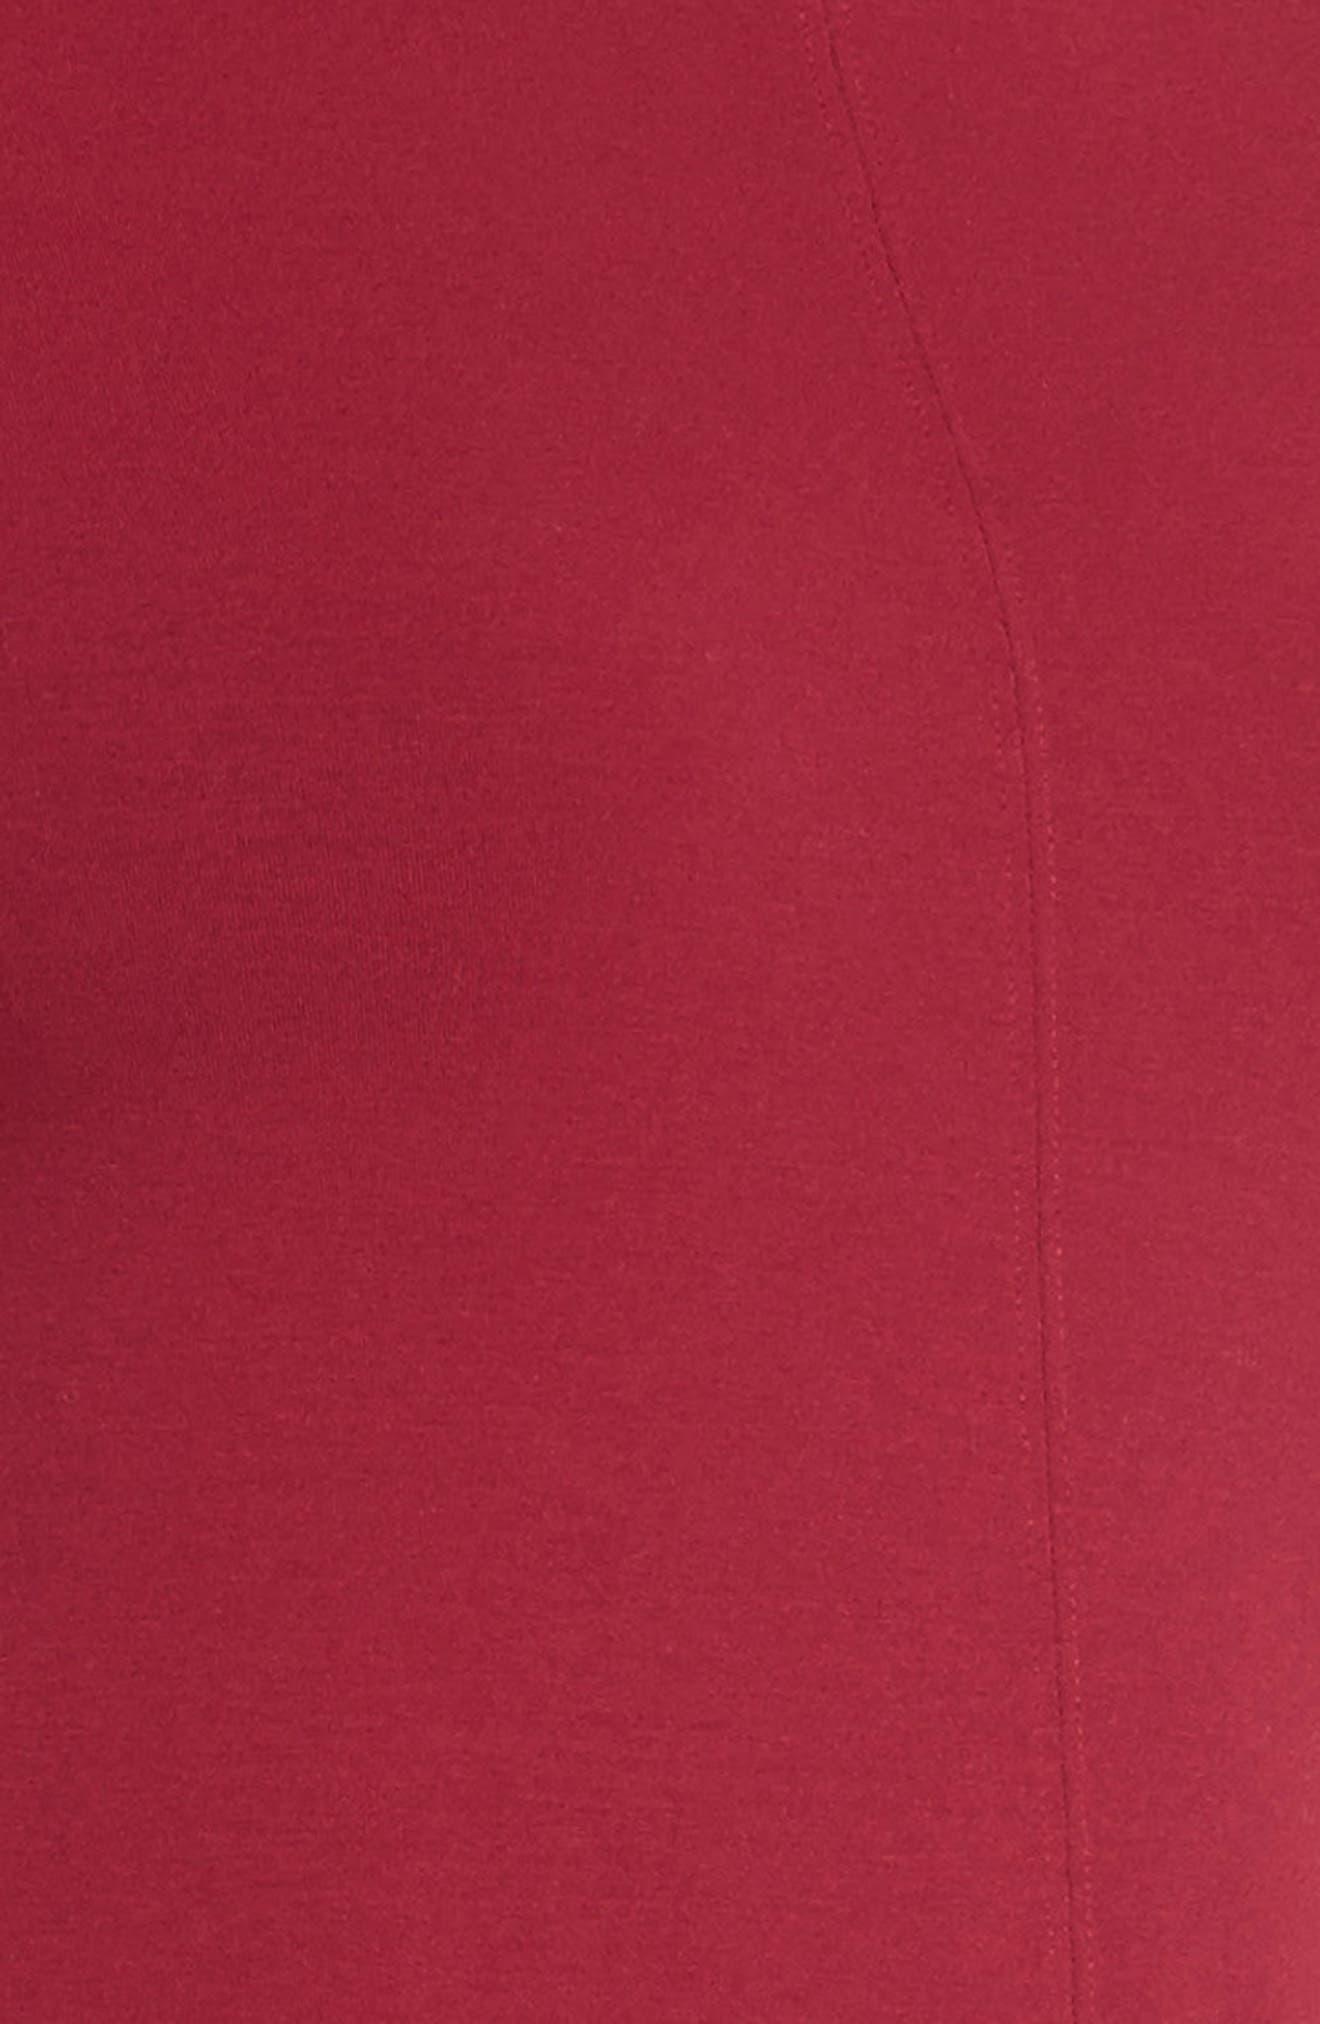 Jersey Bateau Neck Tunic,                             Alternate thumbnail 57, color,